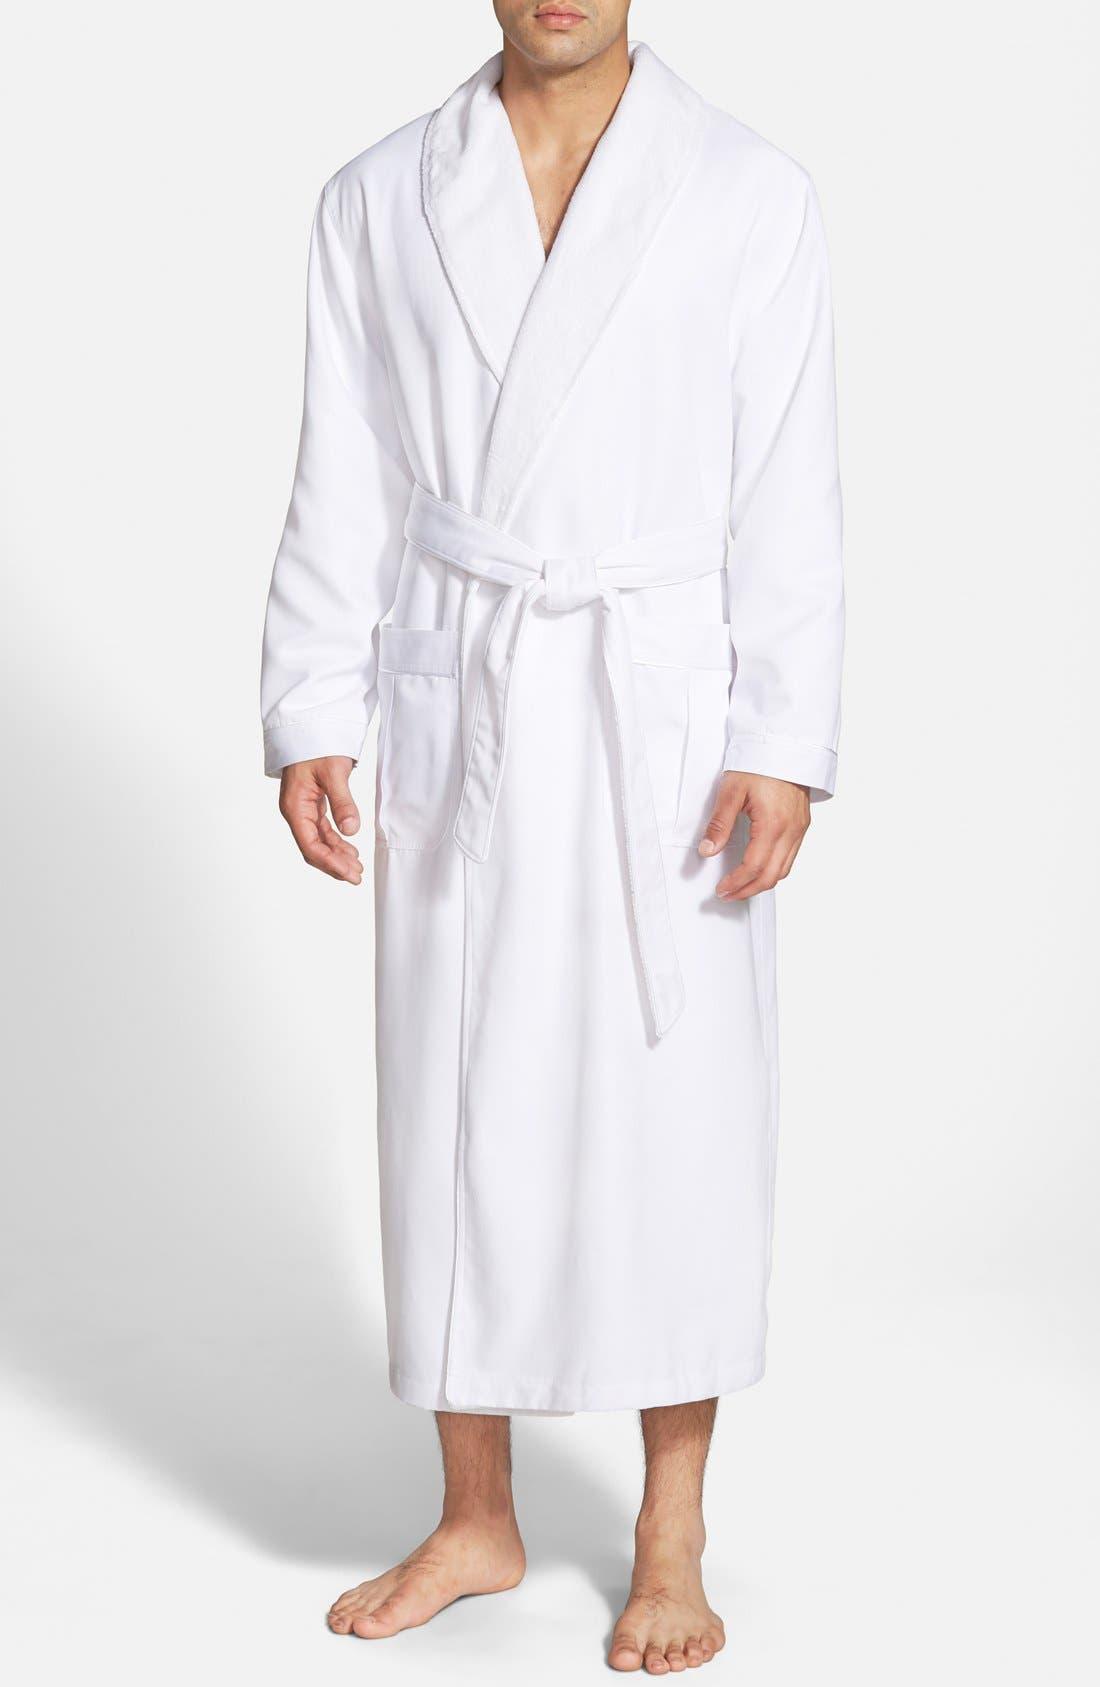 MAJESTIC INTERNATIONAL Fleece Lined Robe, Main, color, WHITE